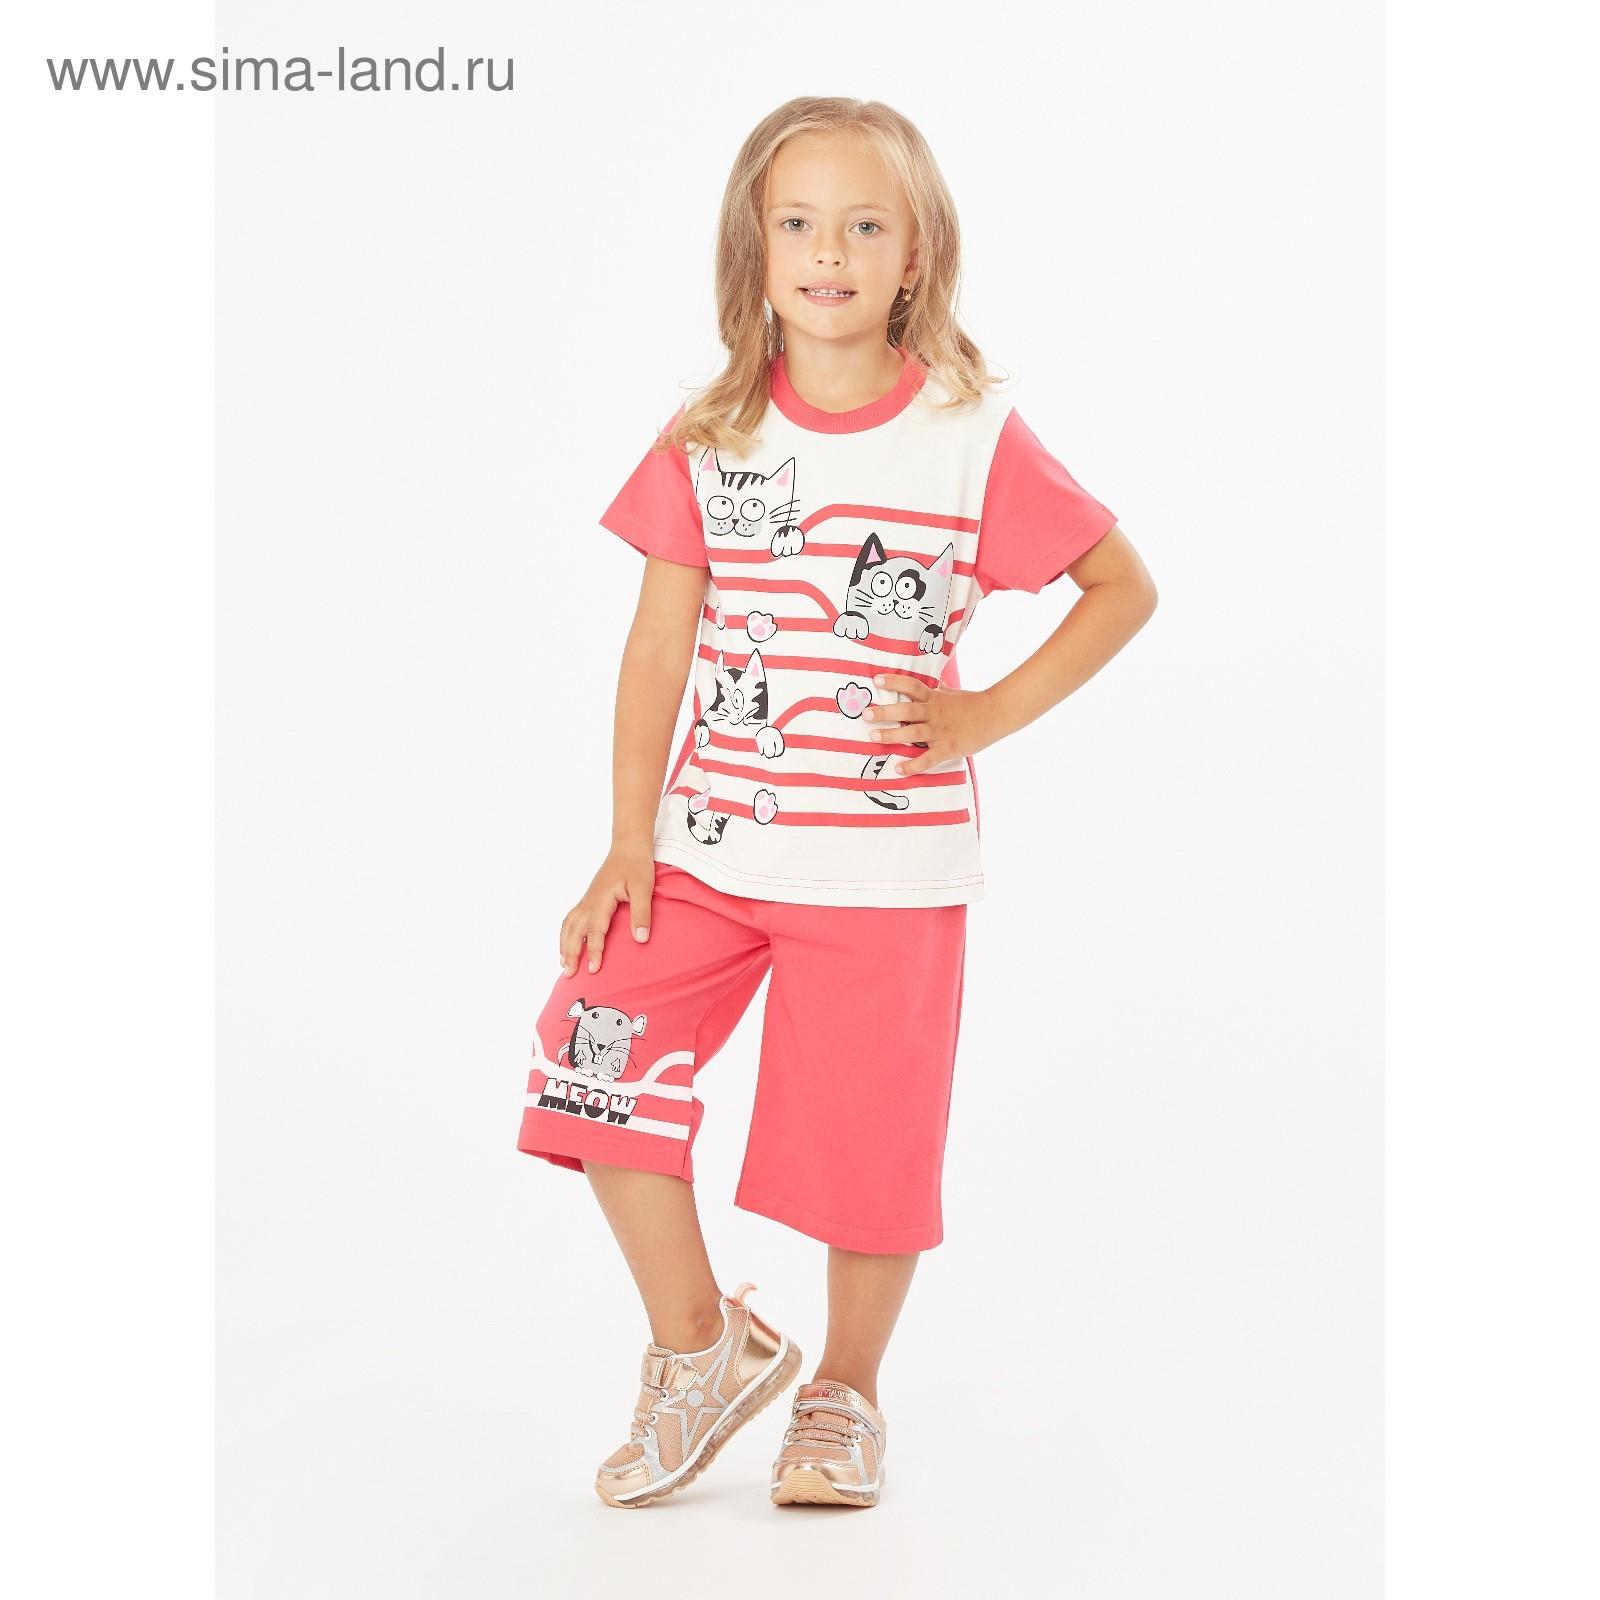 61d62c6b7ebe0 Пижама для девочки, цвет светло-розовый, рост 110 см (4418265 ...